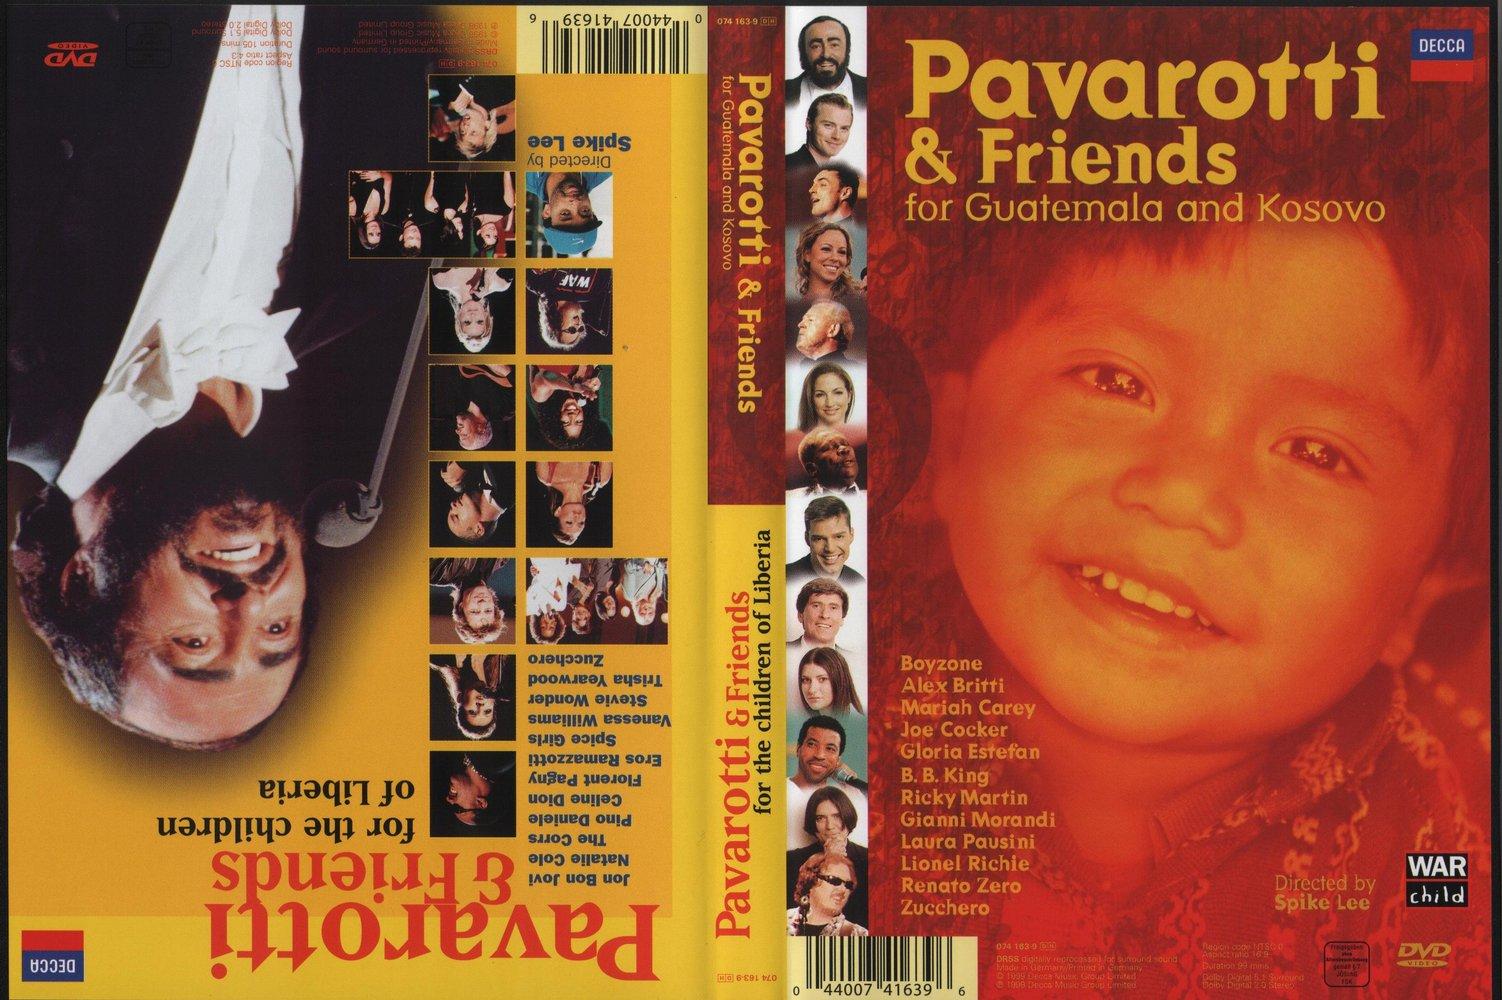 http://4.bp.blogspot.com/_se0zHB8H7oU/S_M064Gz6kI/AAAAAAAACnk/P2Y0uN4iqJc/s1600/Pavarotti+%26+Friends+-+For+Guatemala+%26+Kosovo+-+Cover.jpg